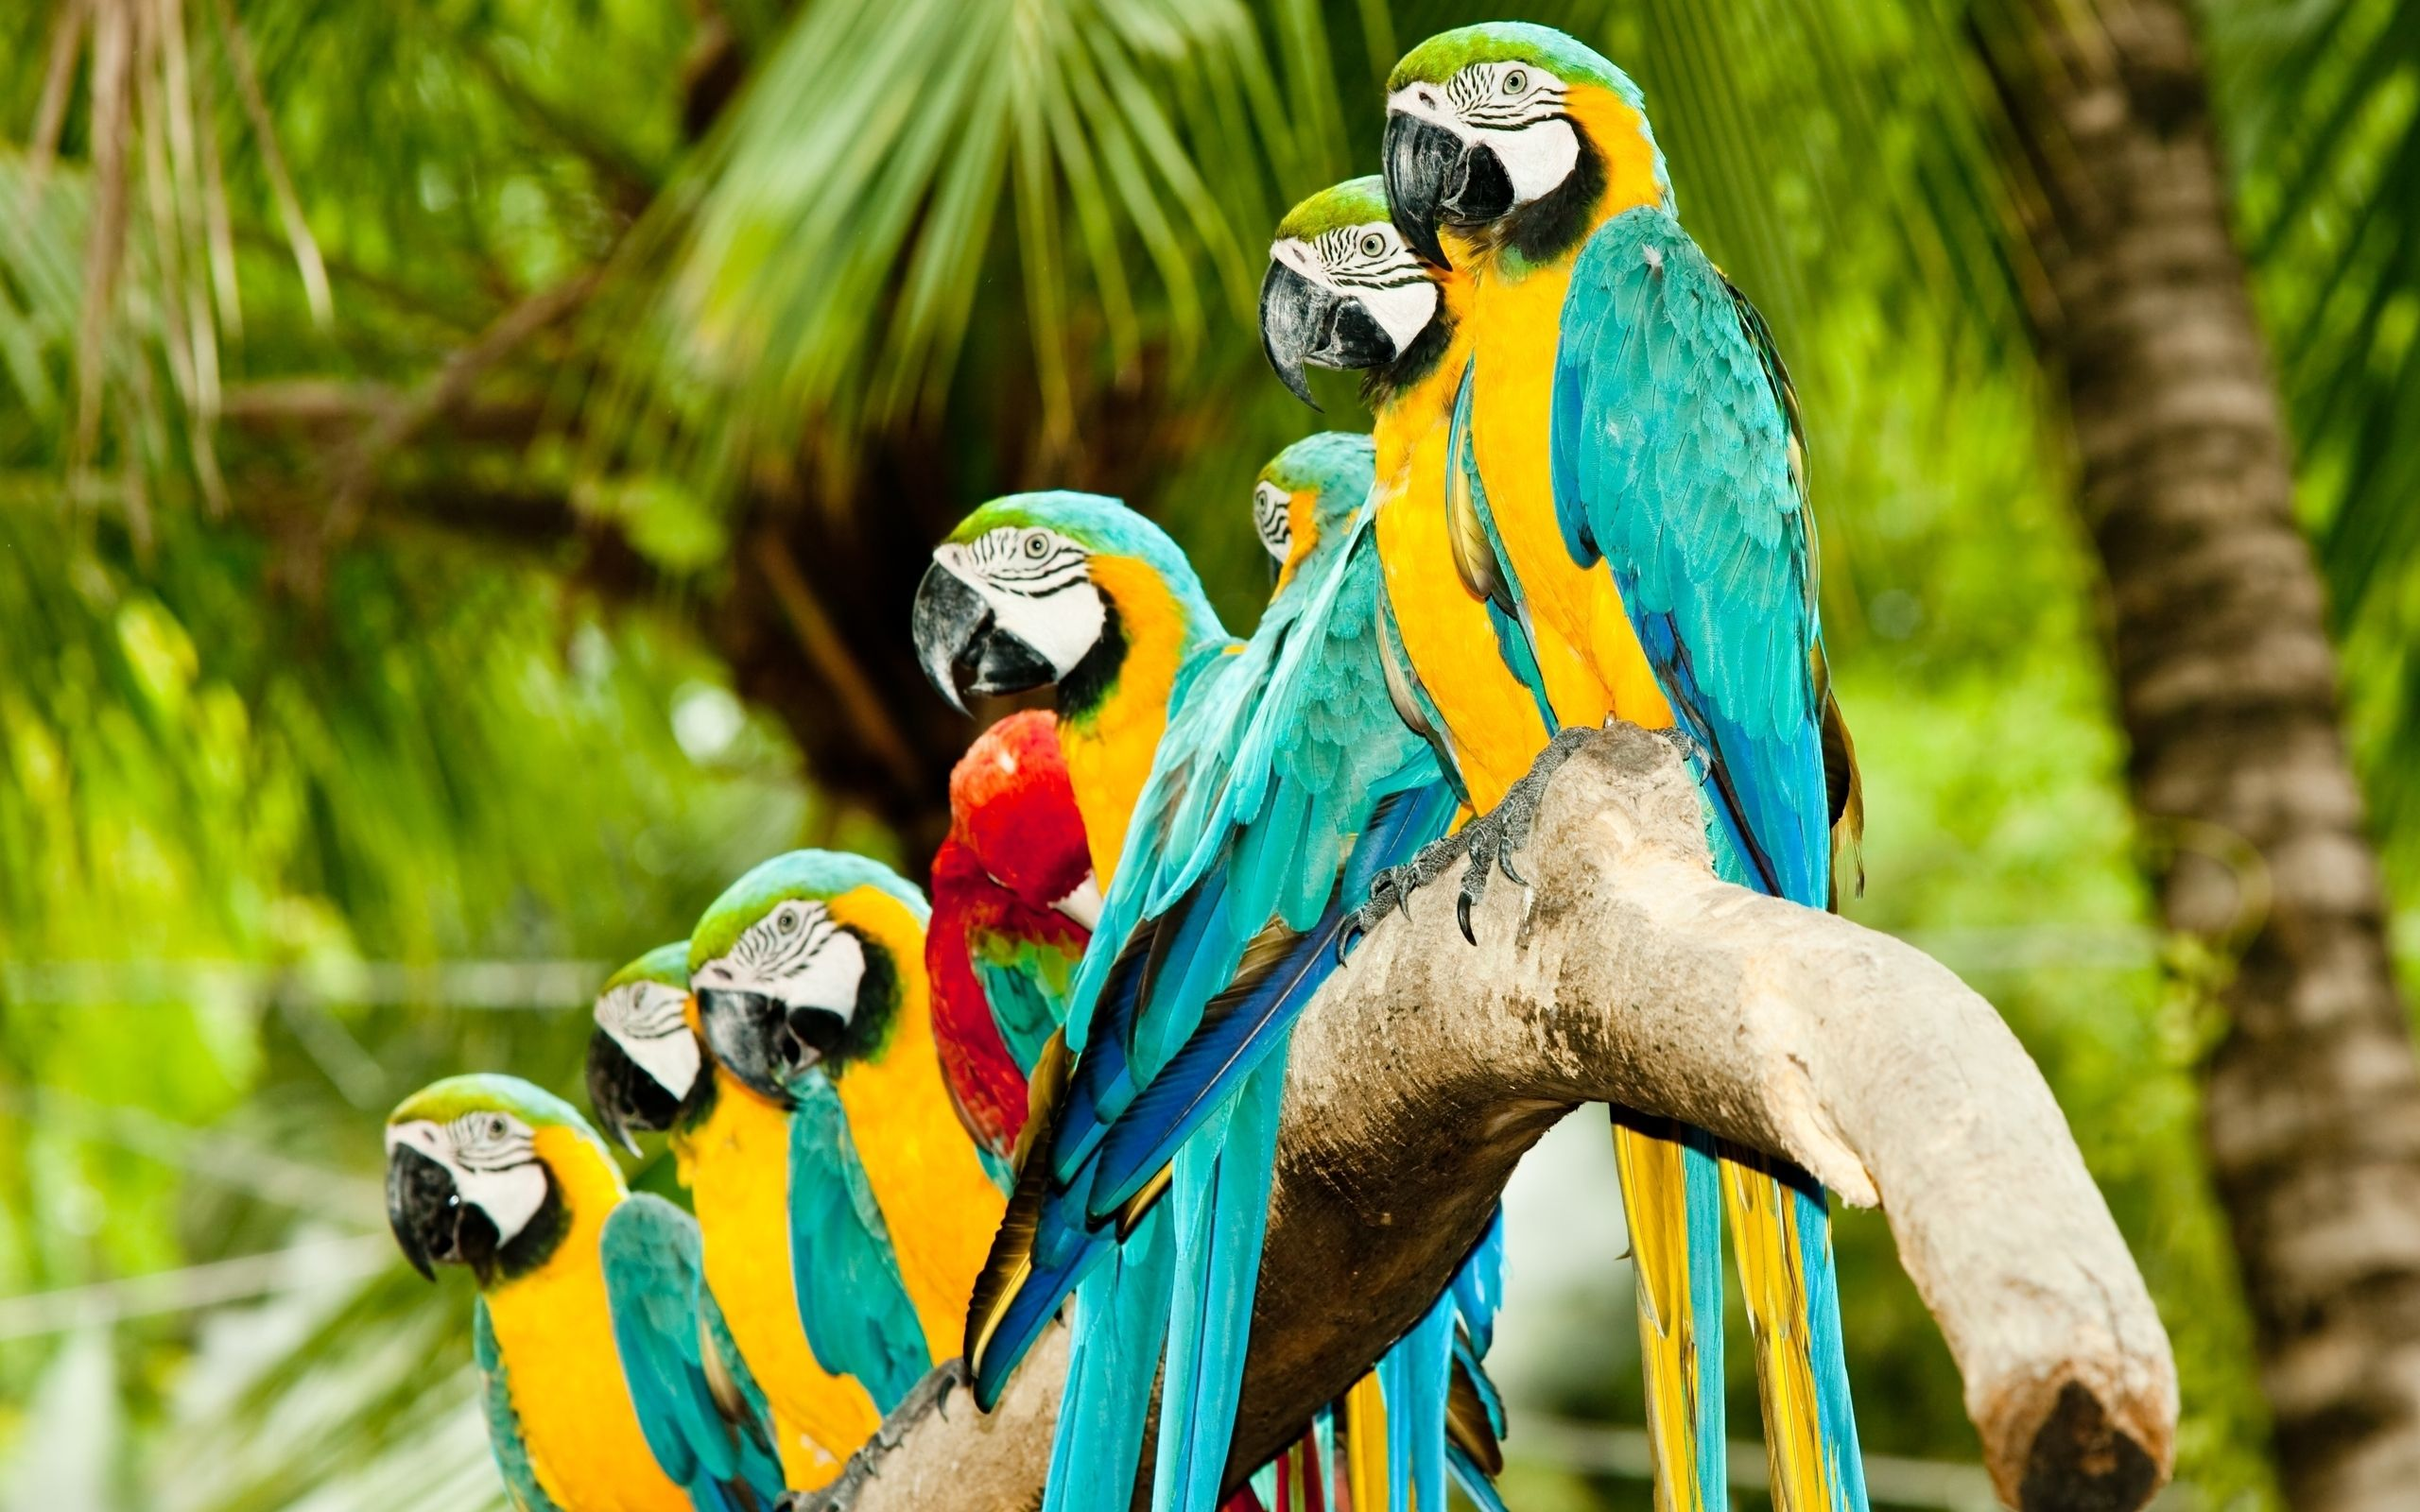 Image Detail For Colourful Parrots Hd Wallpaper Birds Hd Widescreen Wallpapers 2560 Pet Birds Animals Beautiful Beautiful Birds